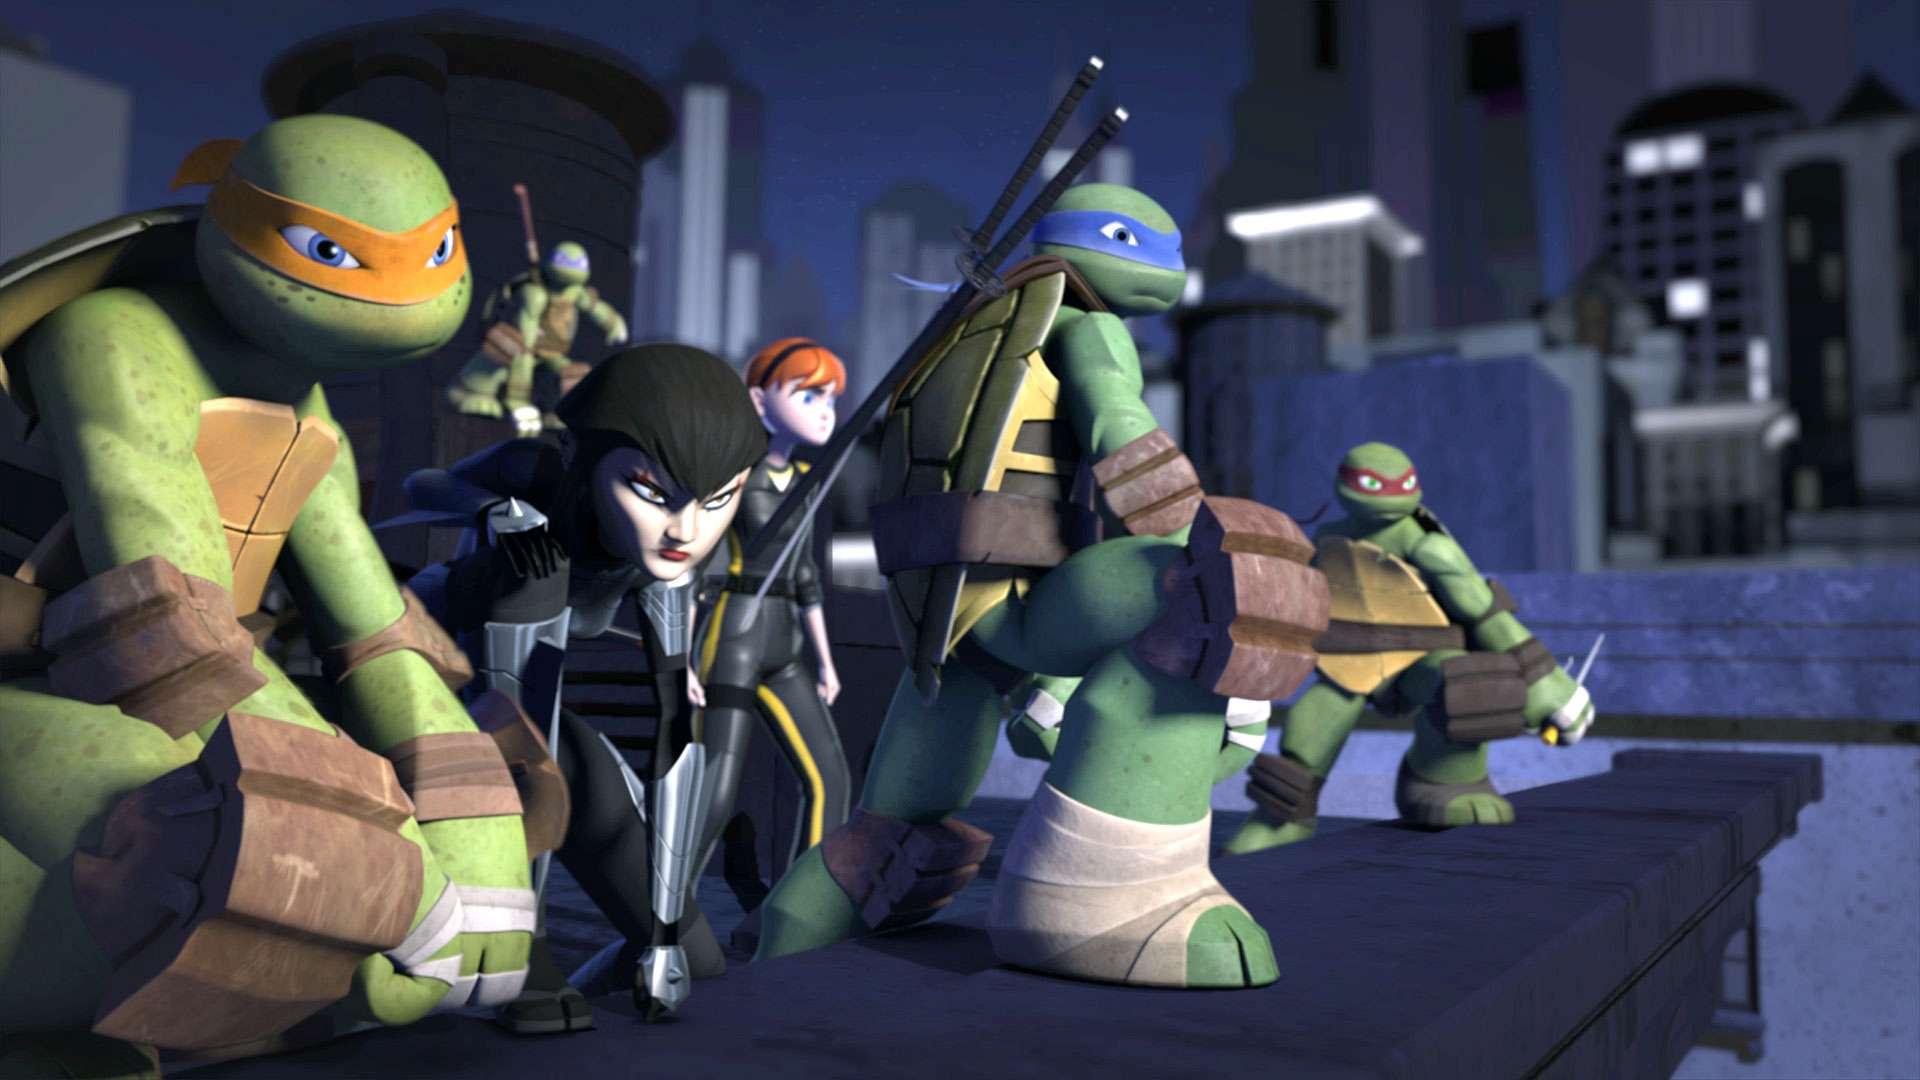 Te Teenage Mutant Ninja Turtles Tv Show - Teenage mutant ninja turtles full episodes scroll of the demodragon season 5 episode 501